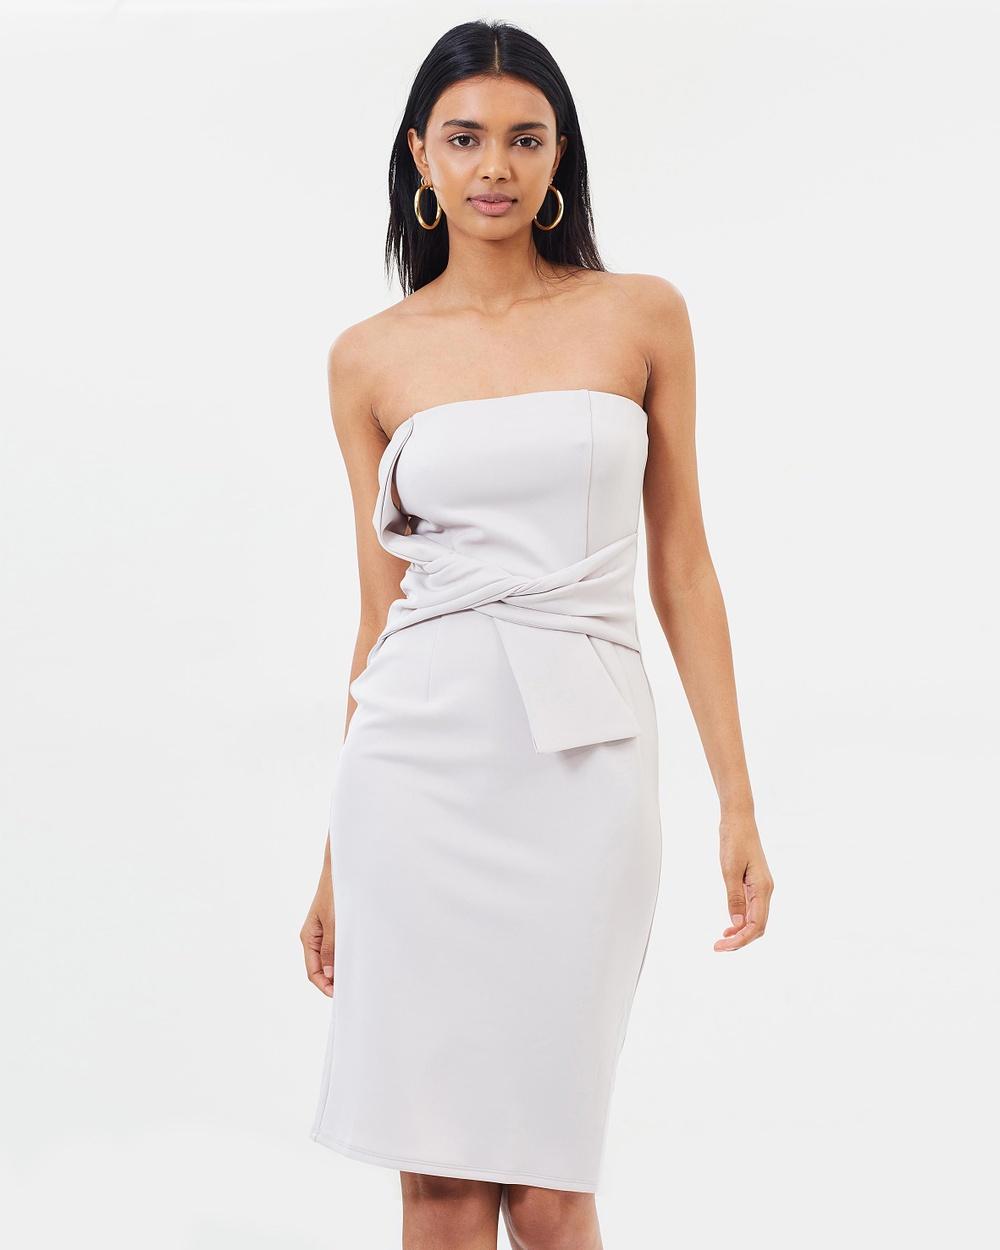 Dorothy Perkins Bandeau Tie Front Body Con Dress Bodycon Dresses Taupe Bandeau Tie Front Body-Con Dress